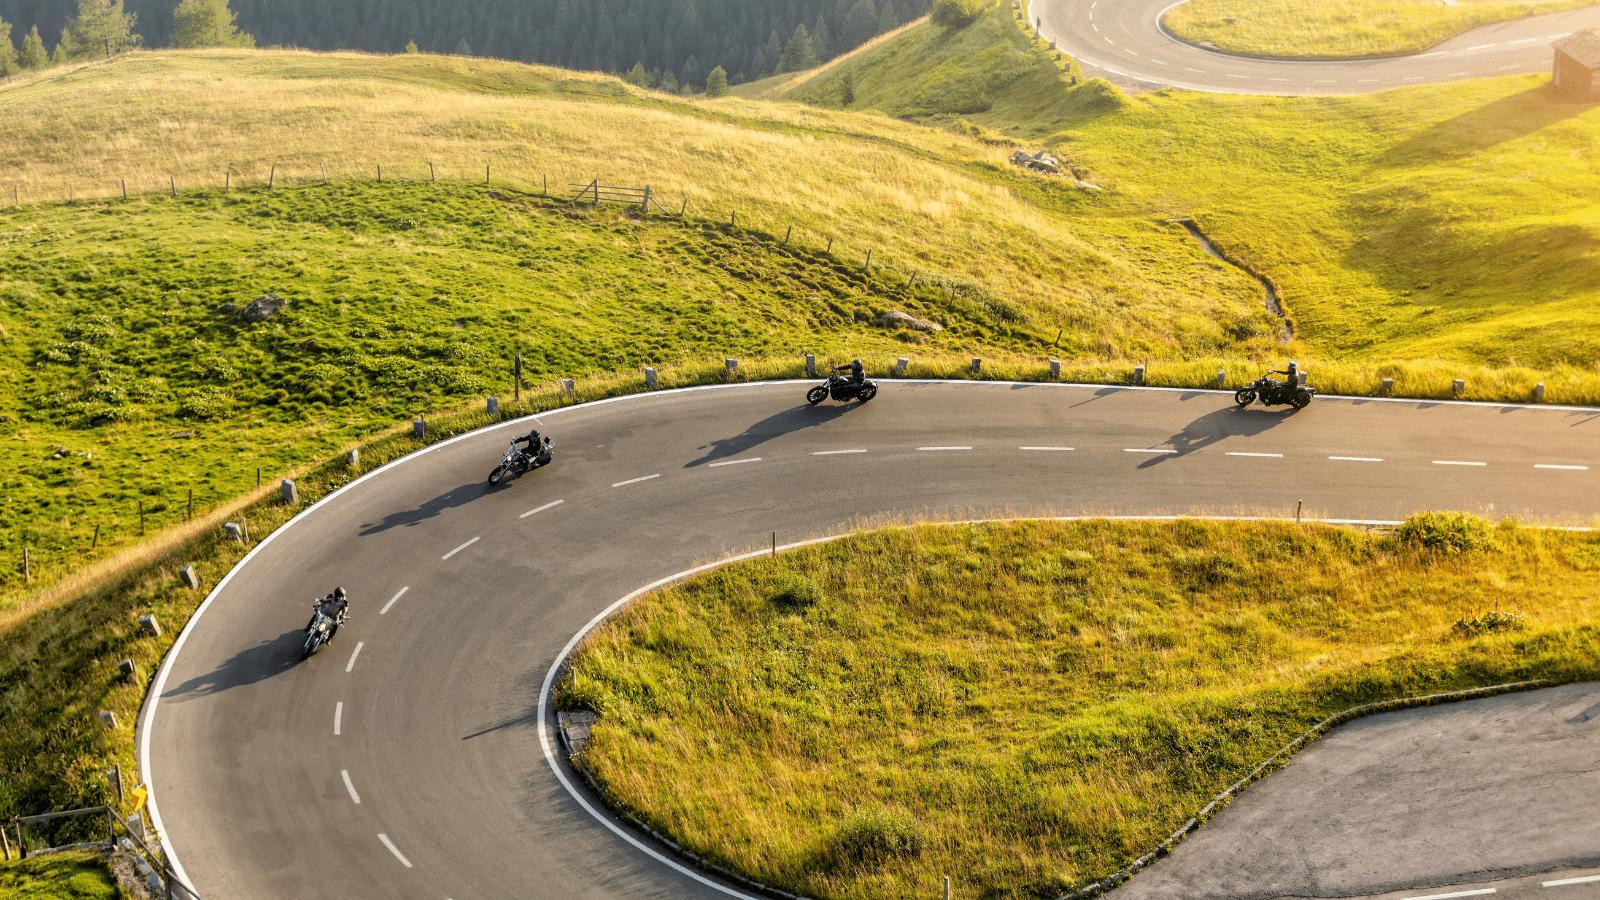 Motoristas en carretera con intercomunicadores